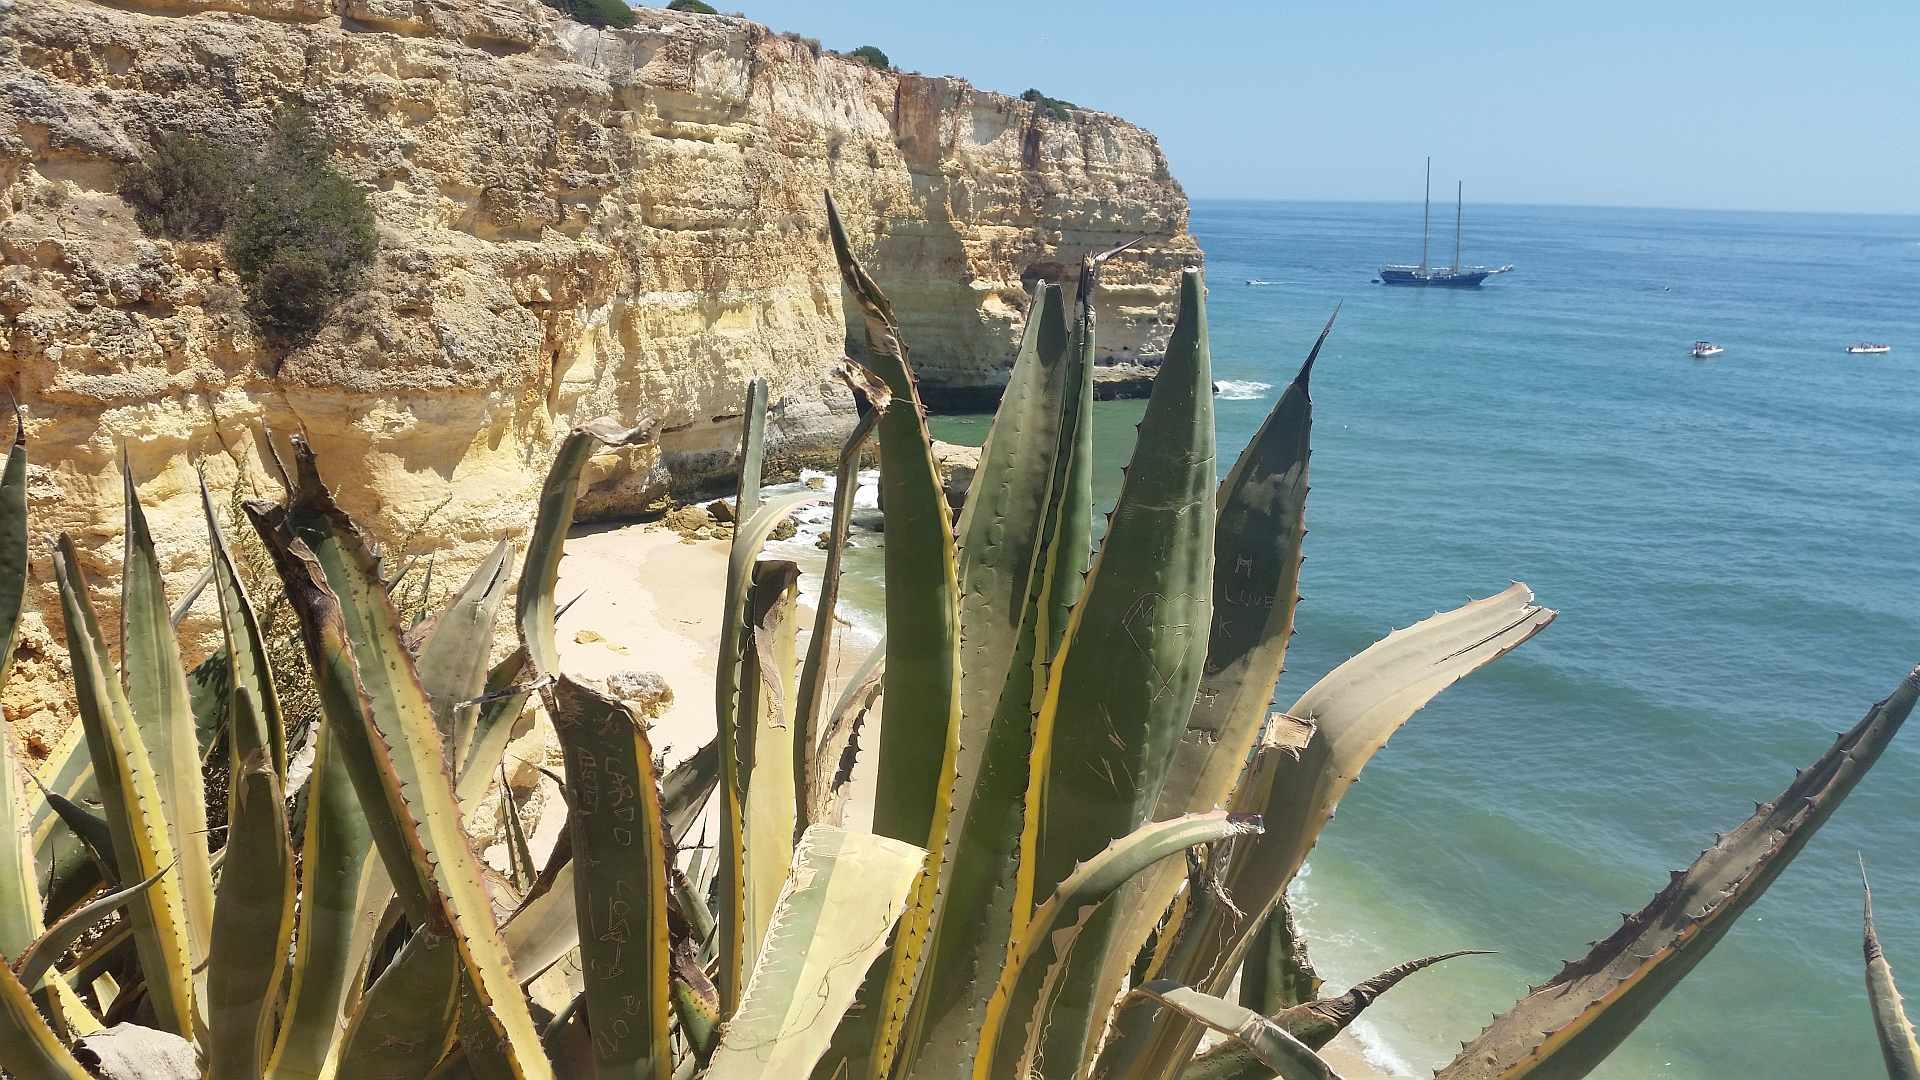 Lagao - Algarve - Praia da Marinha - hidden and inaccessible part of the beach